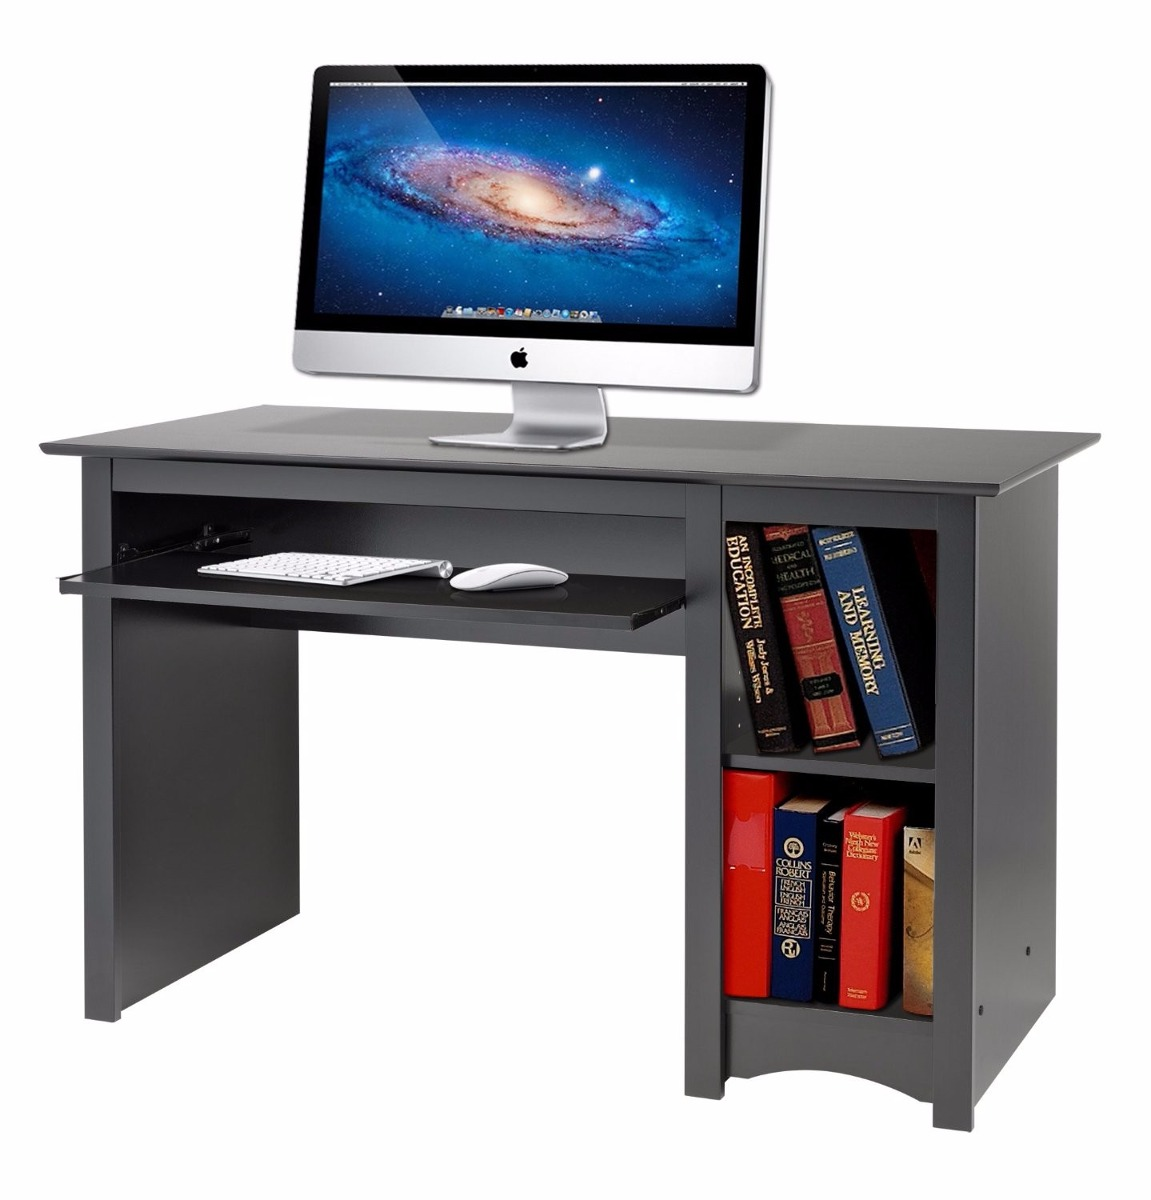 Escritorio mueble para computadora de prepac sonoma vbf for Mueble para escritorio